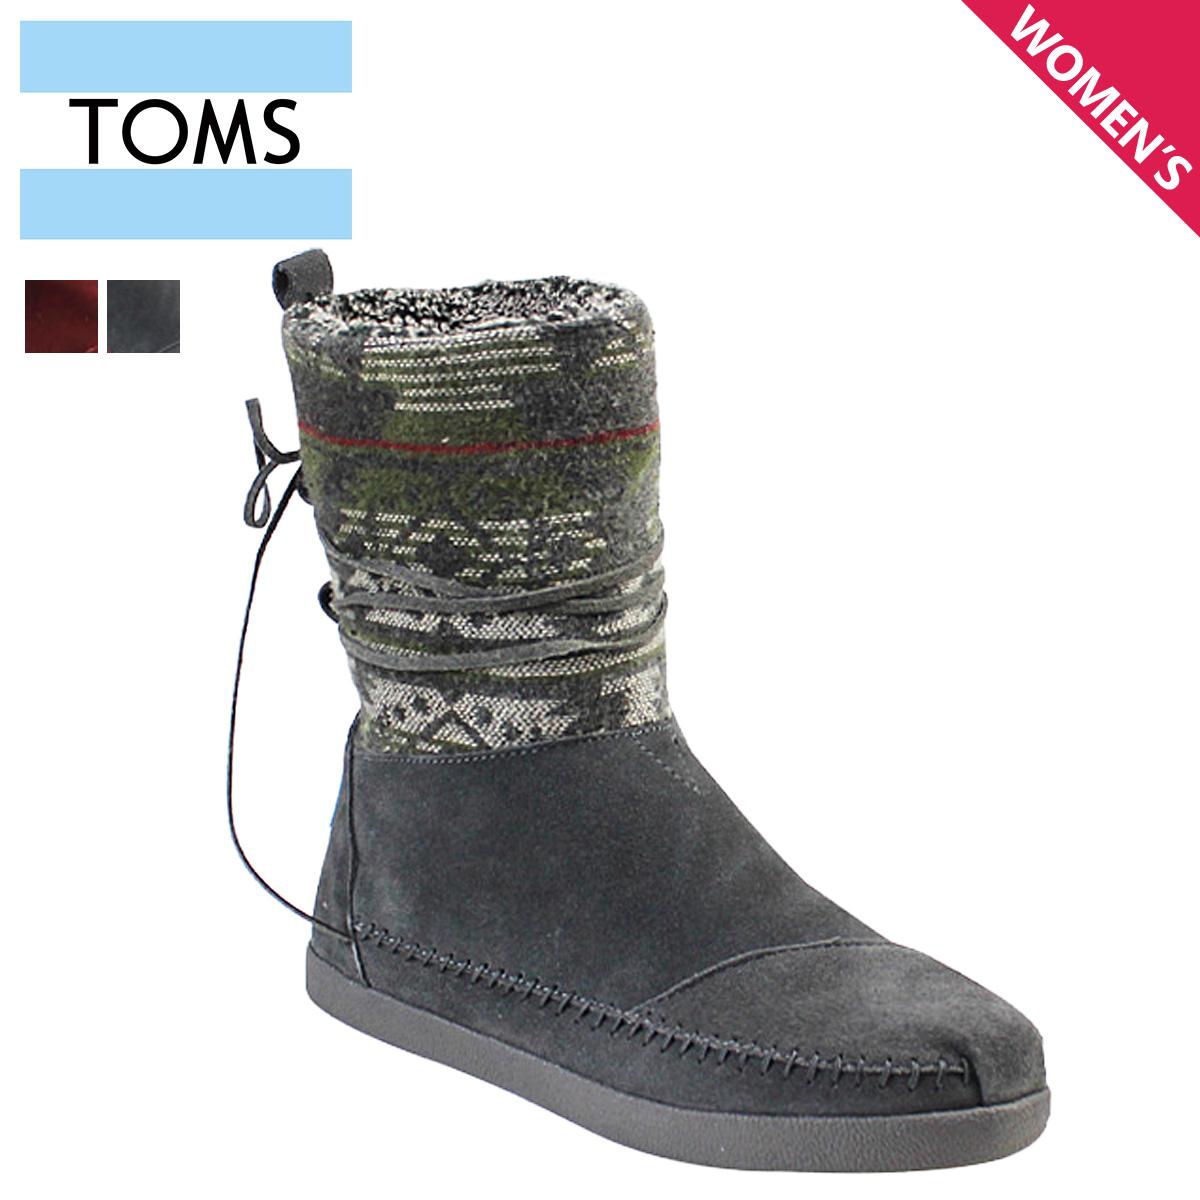 TOMS SHOES Toms shoes suede Jacquard Womens Nepal boots 2 color 1000065  Suede Jacquard Women s Nepal Boots Womens suede TMS  regular  8798c3af9e